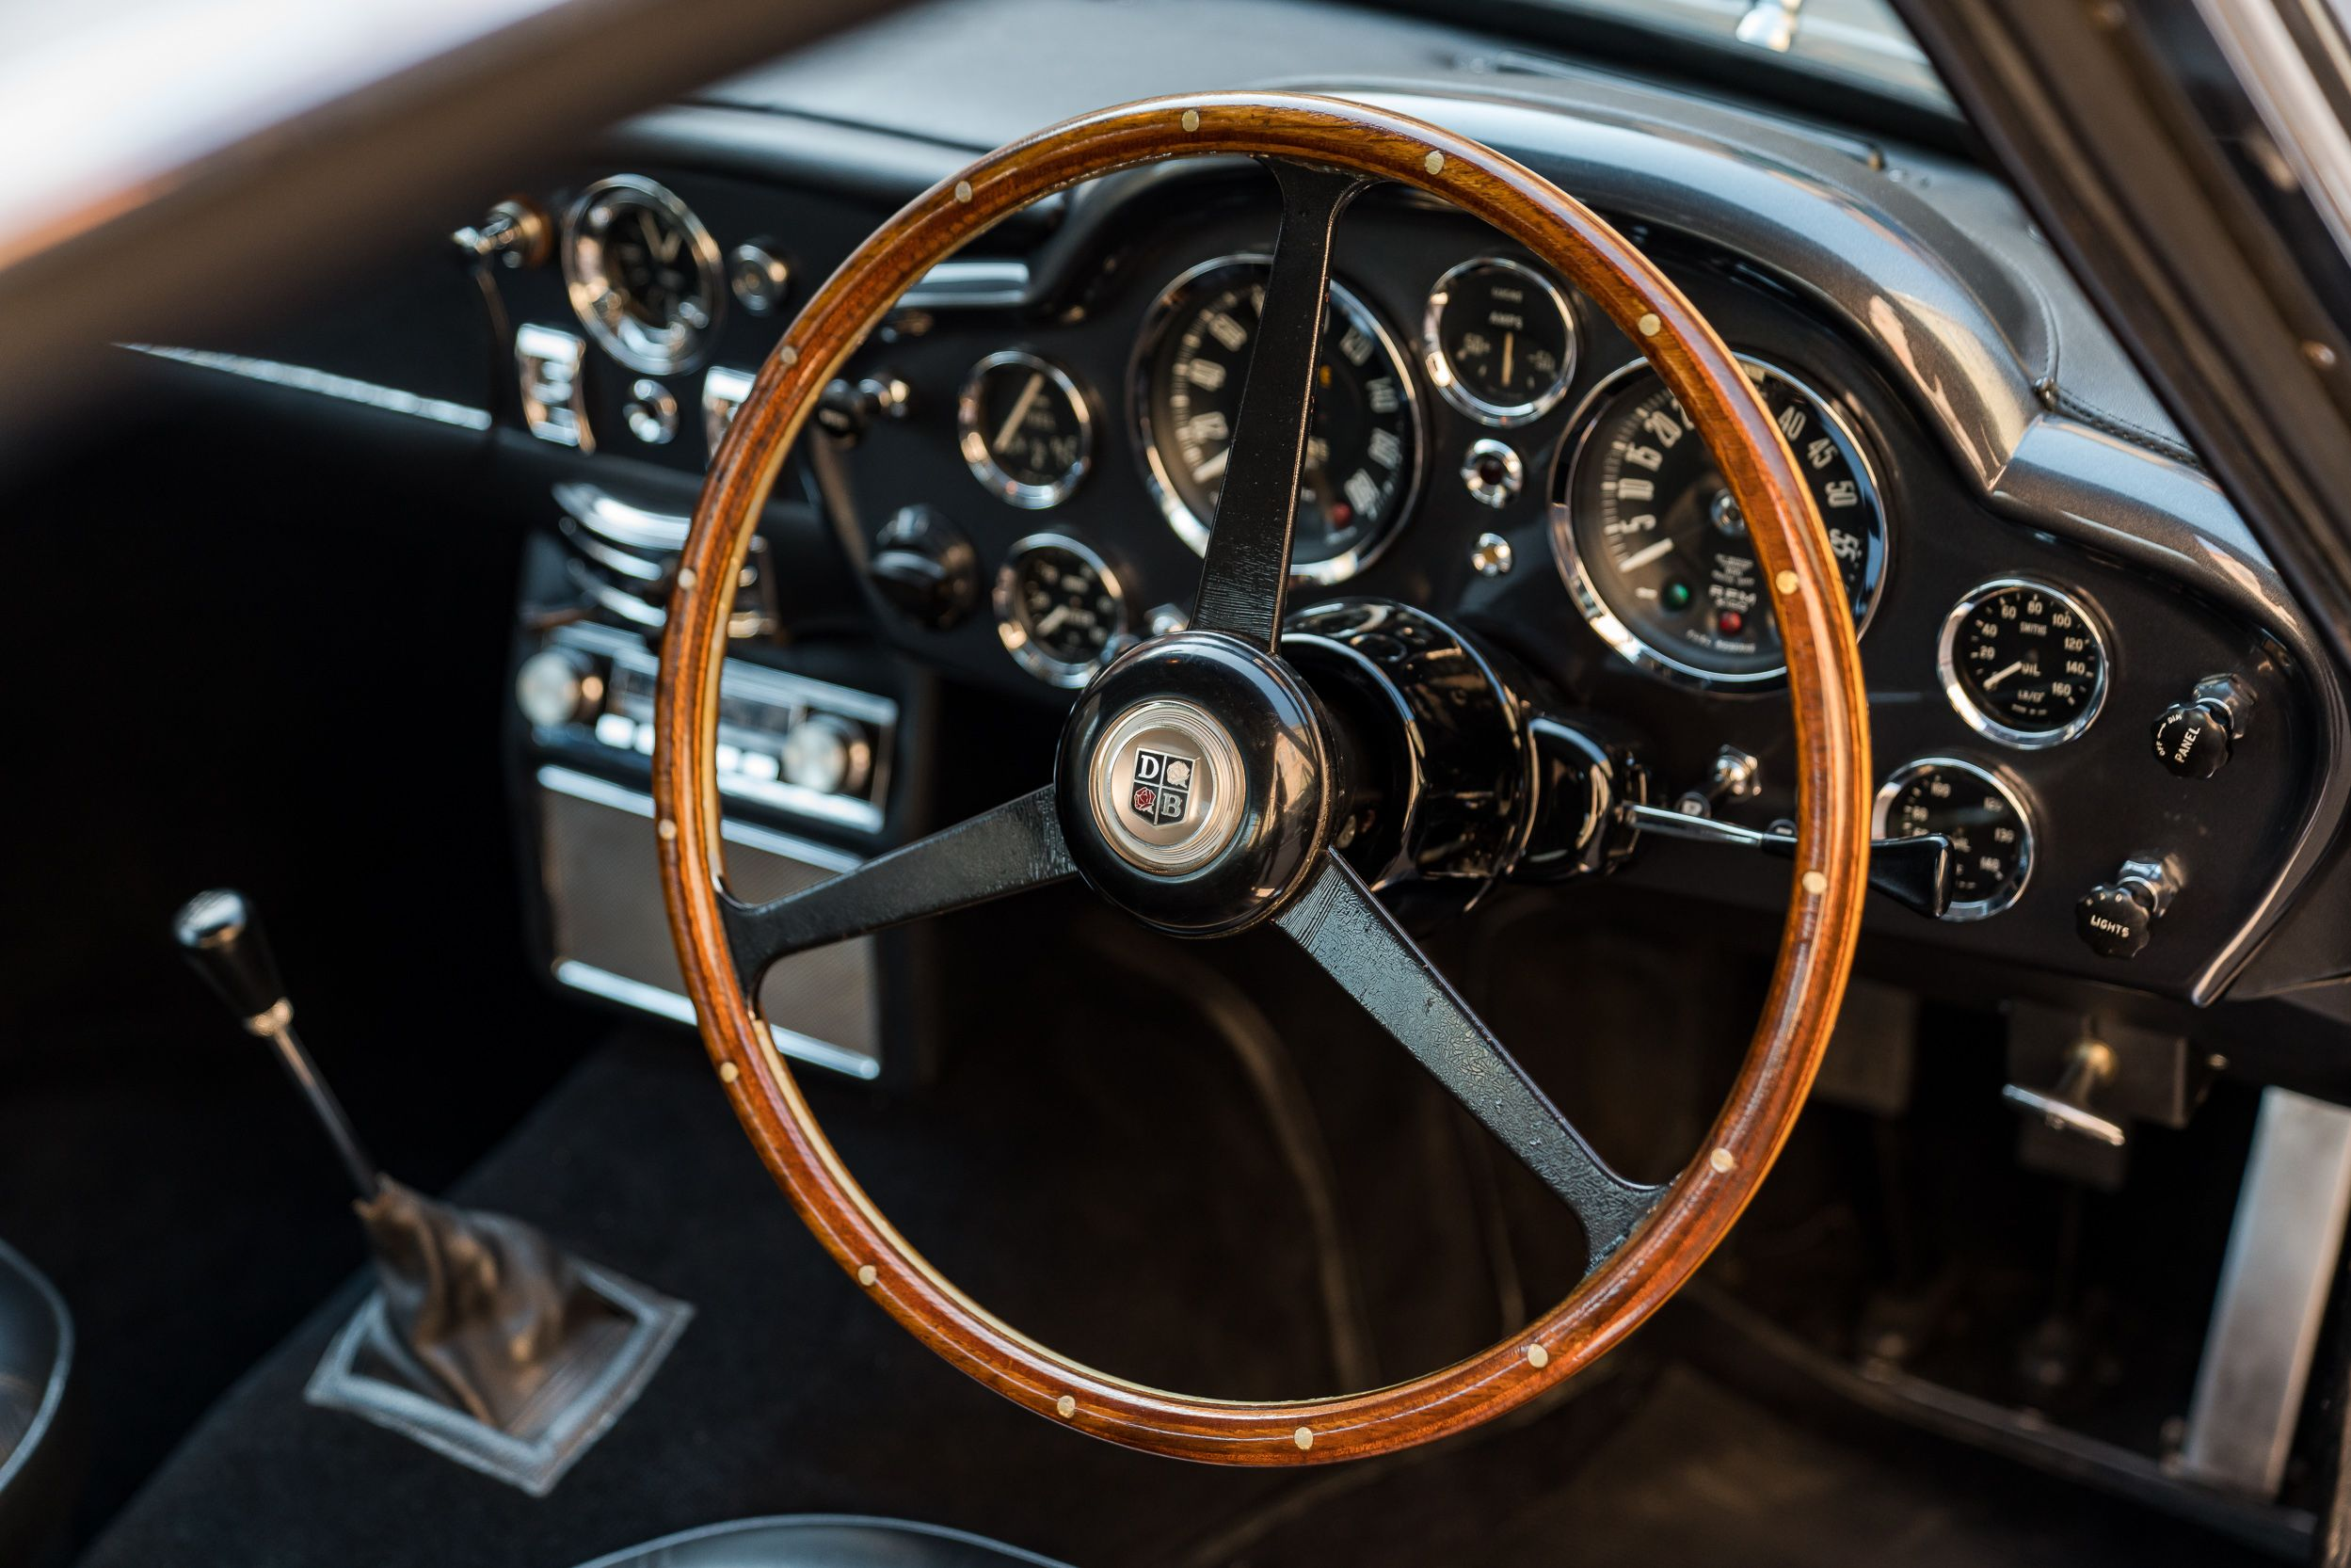 1966 Aston Martin Db6 Vantage Lbi Limited Aston Martin Db6 Aston Martin Aston